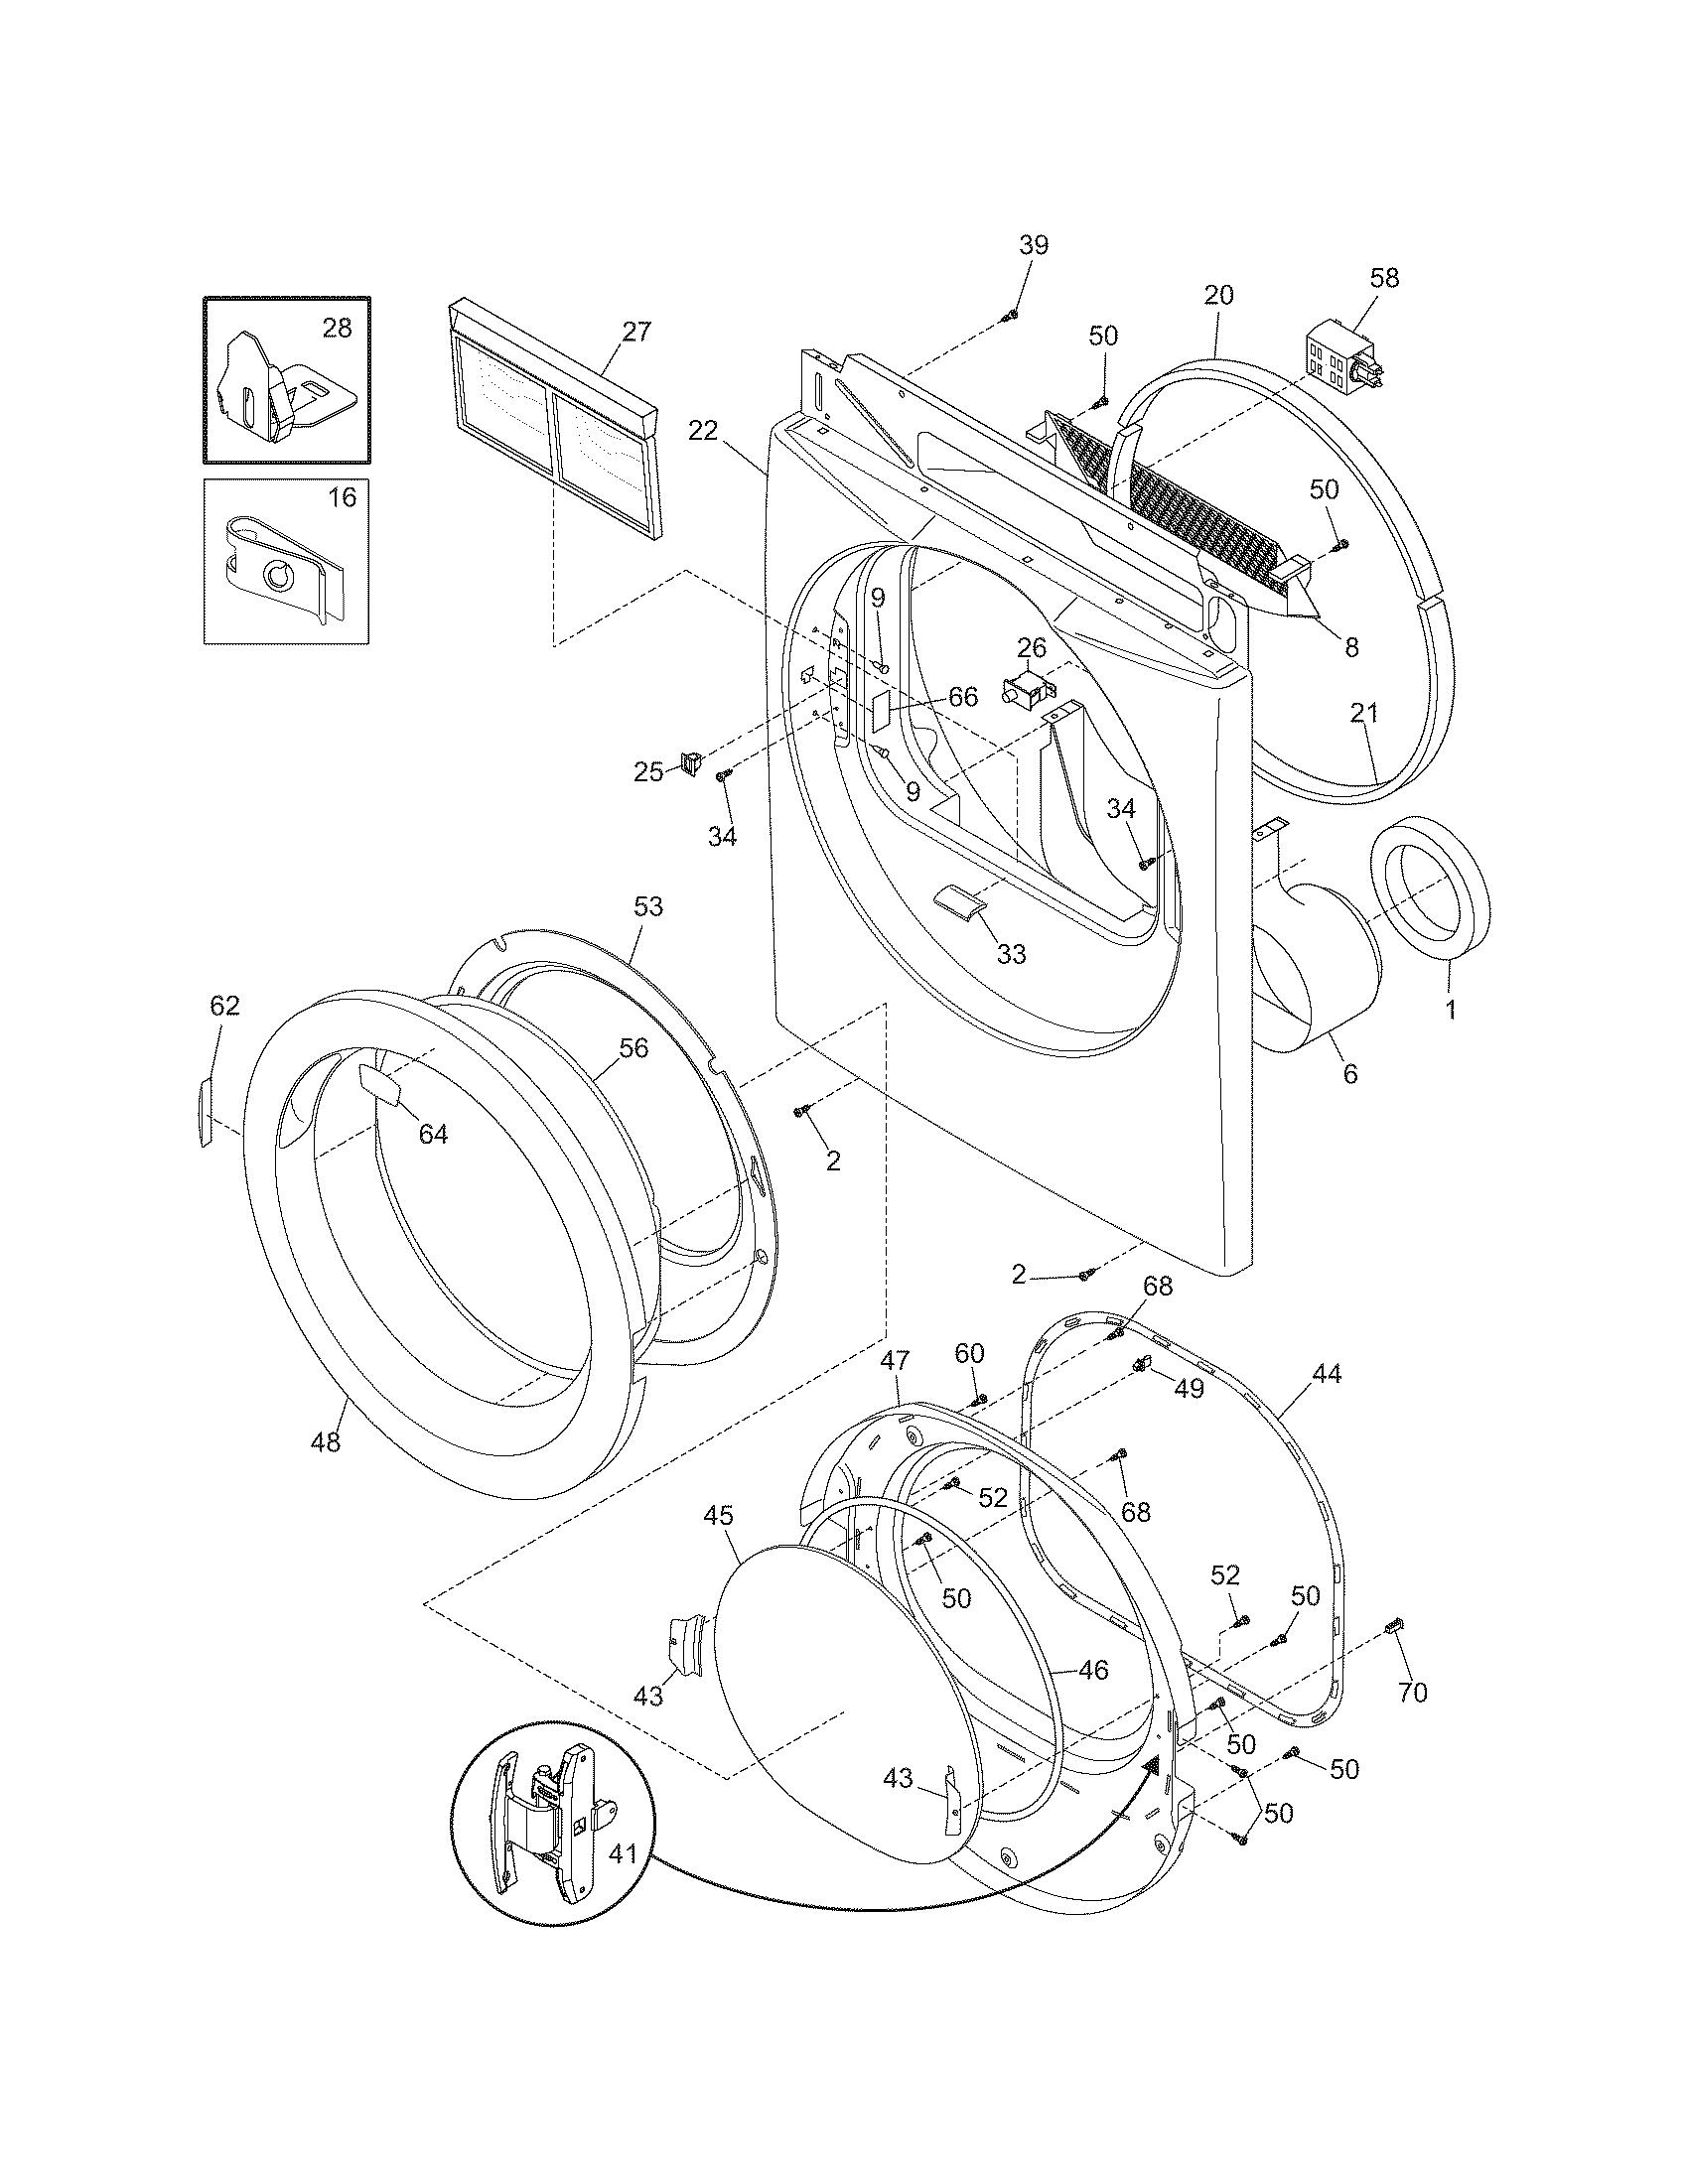 FRONT PANEL/LINT FILTER Diagram & Parts List for Model